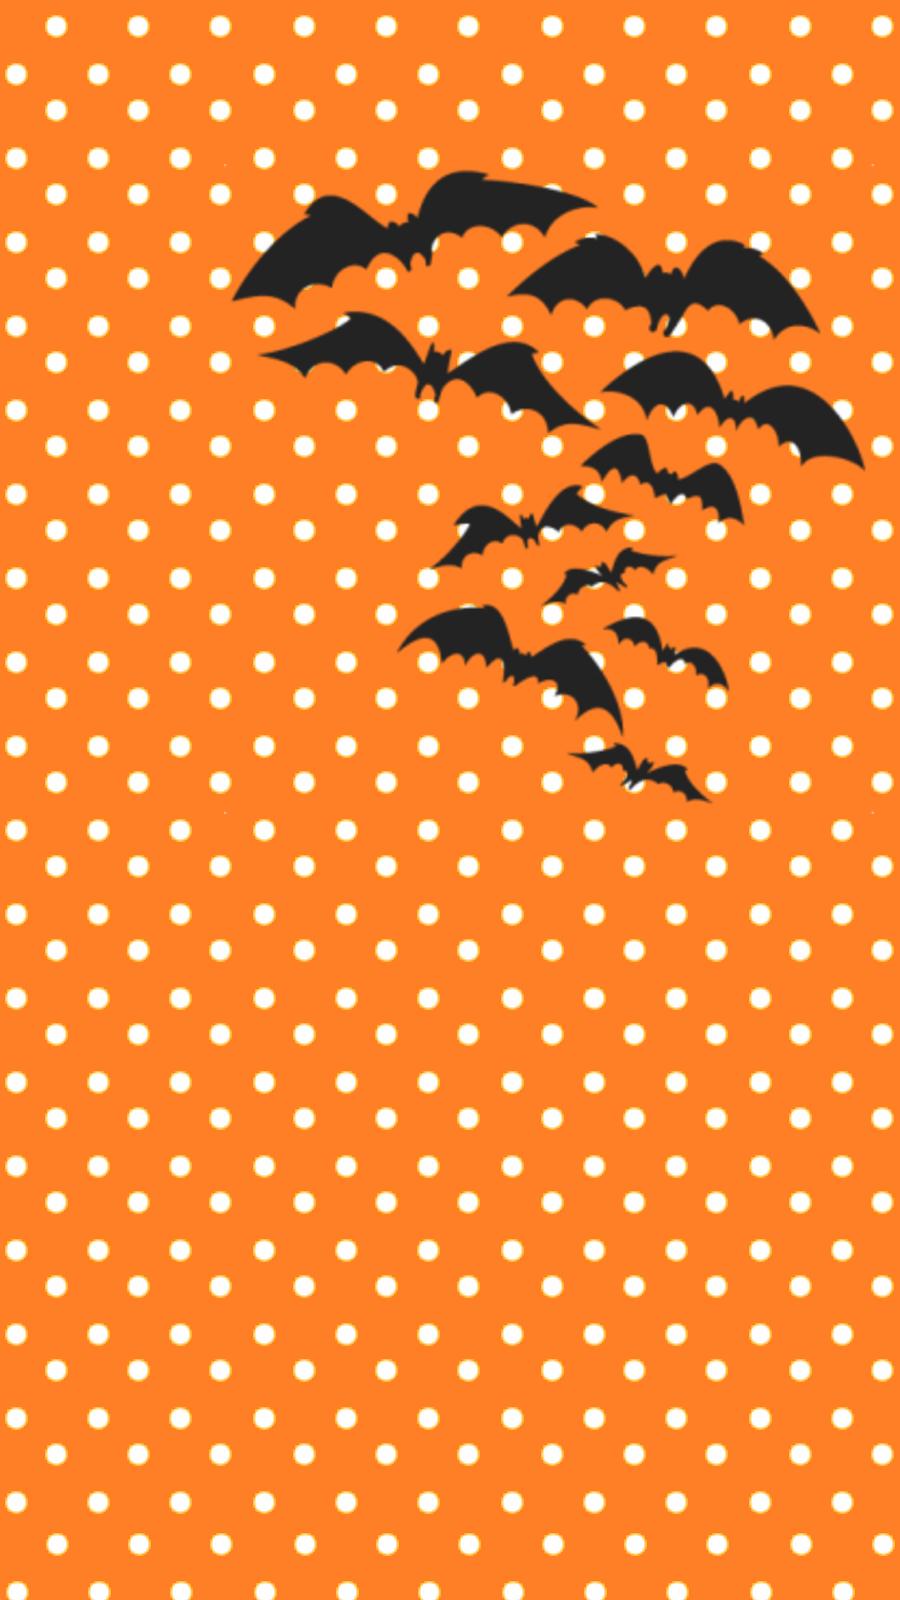 ♥LuvNote2 Halloween tjn Halloween wallpaper iphone